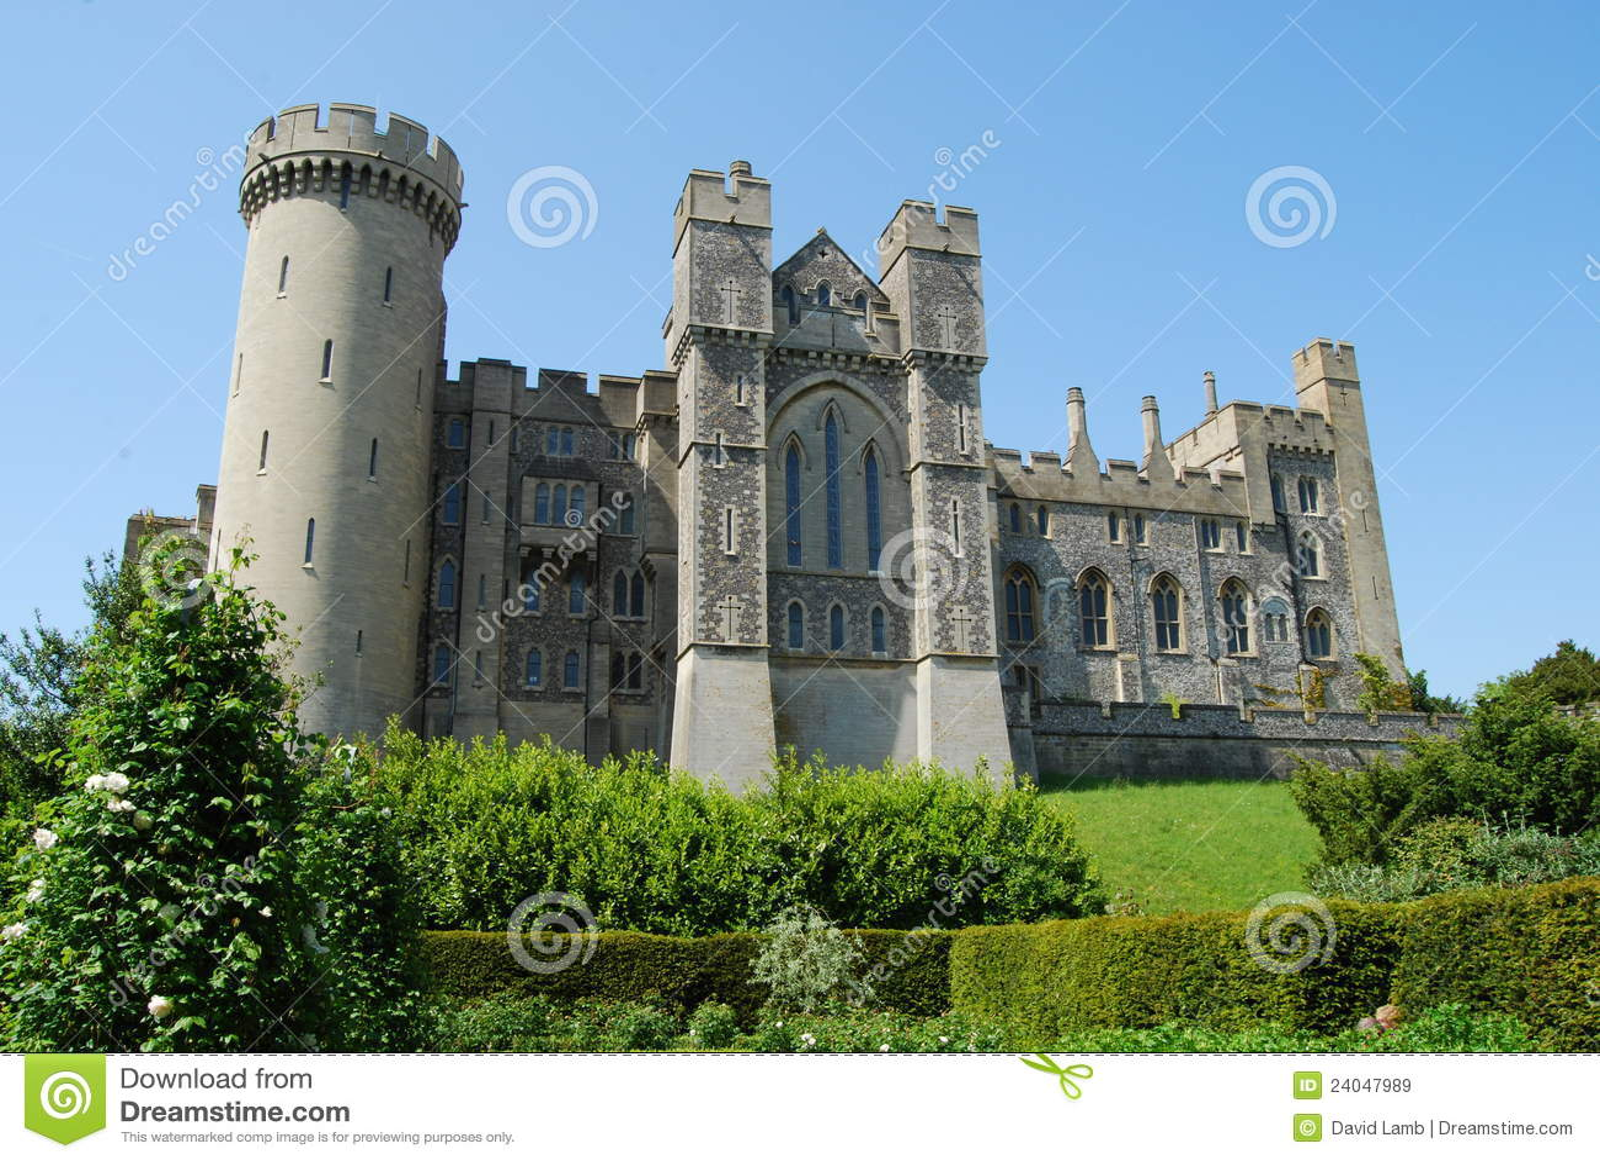 Royalty Free Stock Images Arundel Castle Image24047989 on Medieval Castle Floor Plans